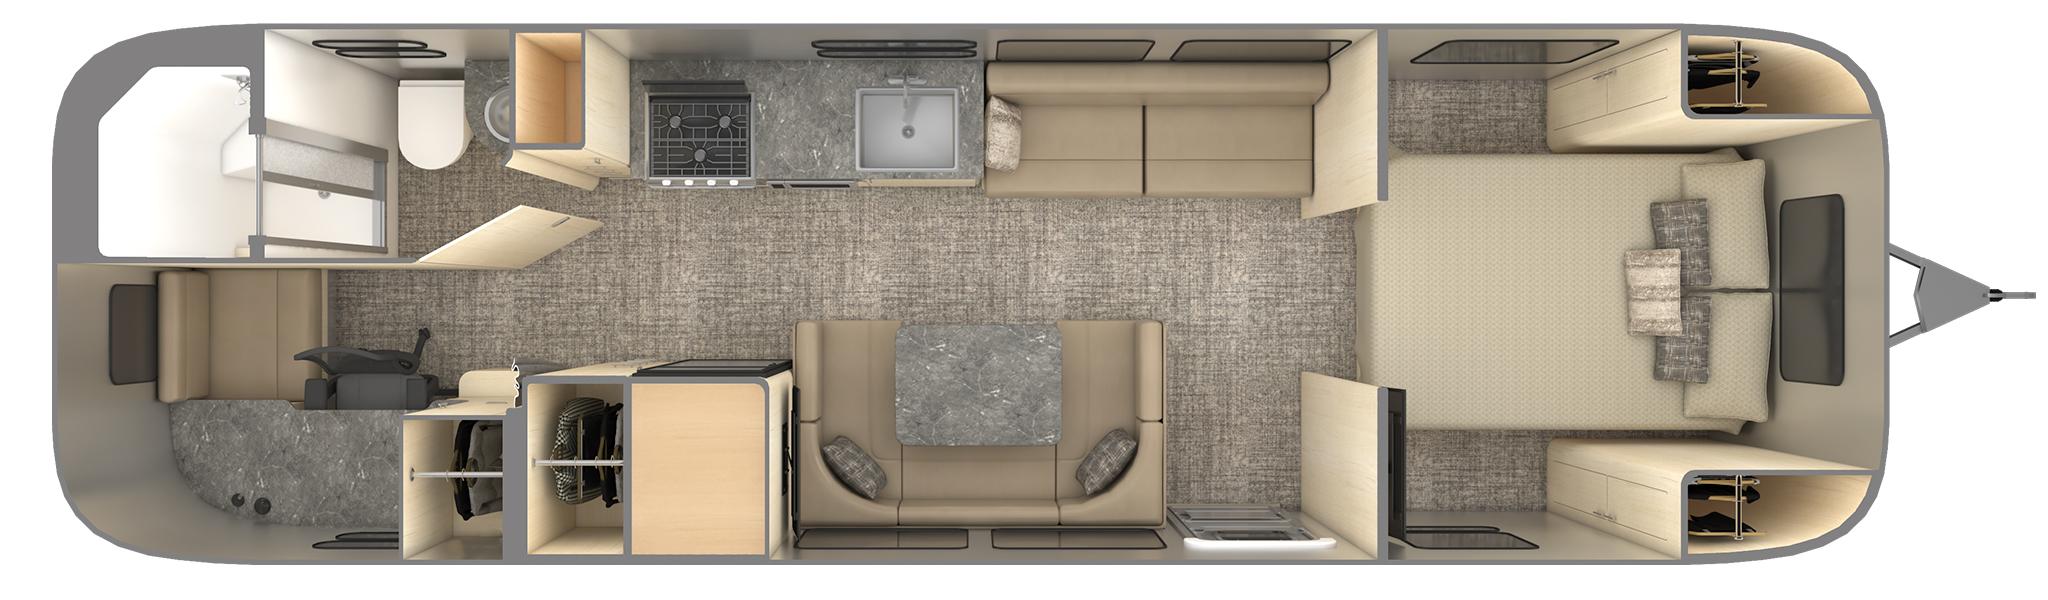 flying cloud 30fb office with desk floor plan